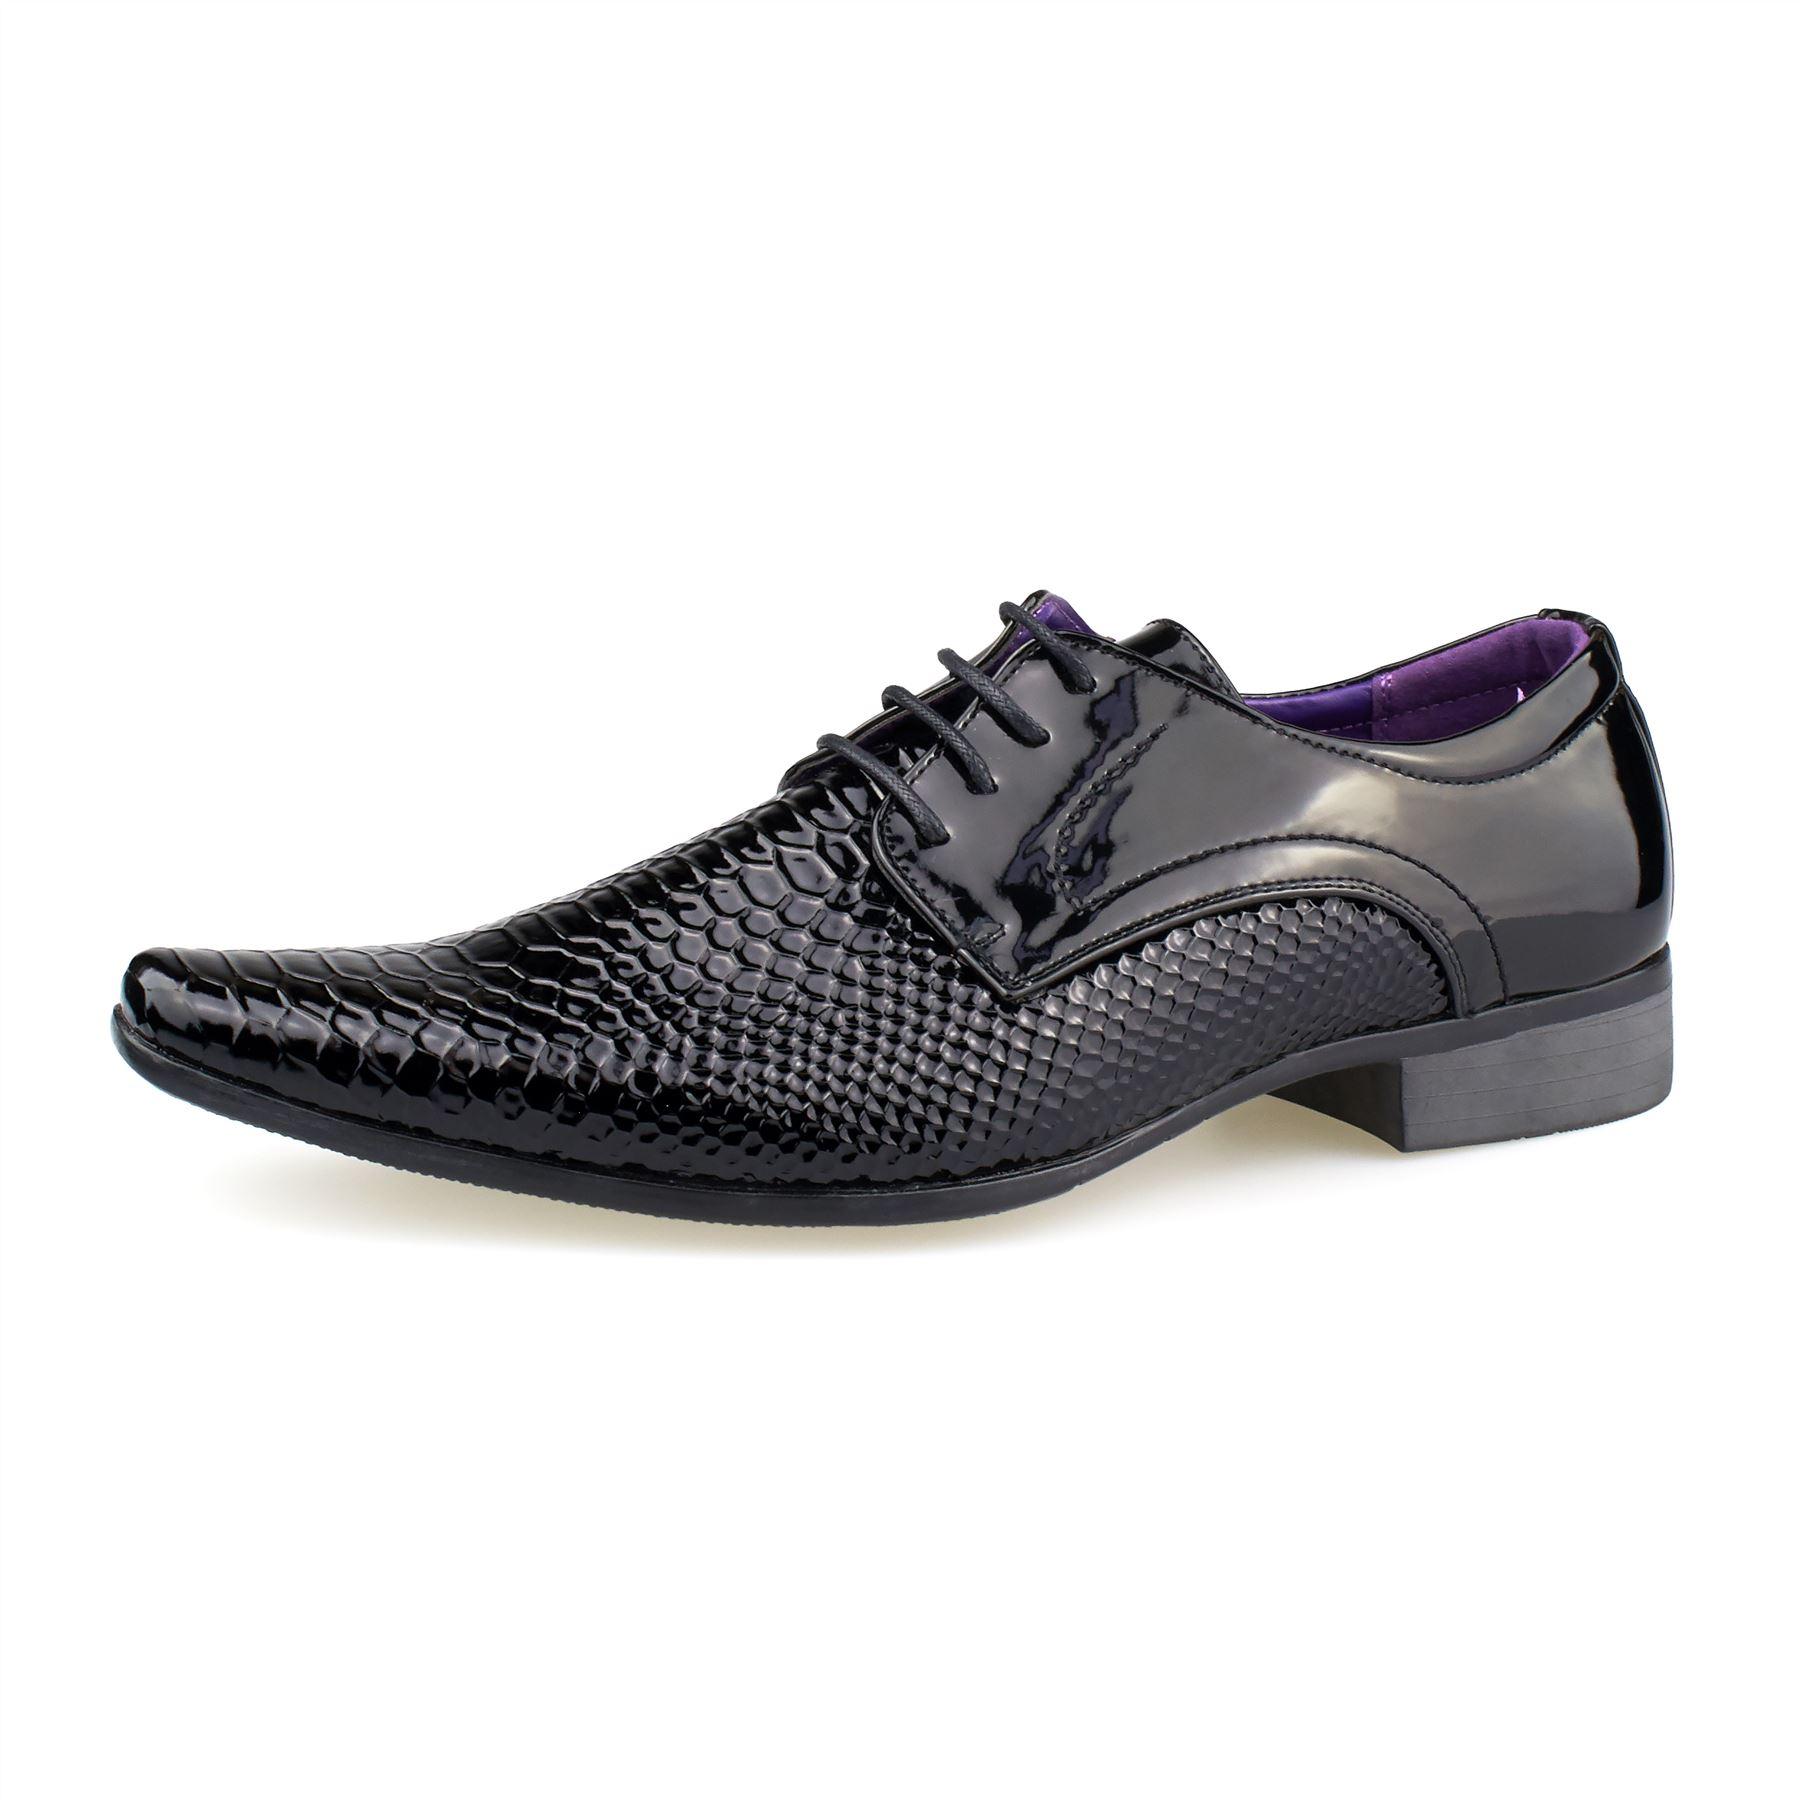 Mens Leather Snake Skin Pattern Shoes Patent Shiny Lace Up Italian Style UK 6-11